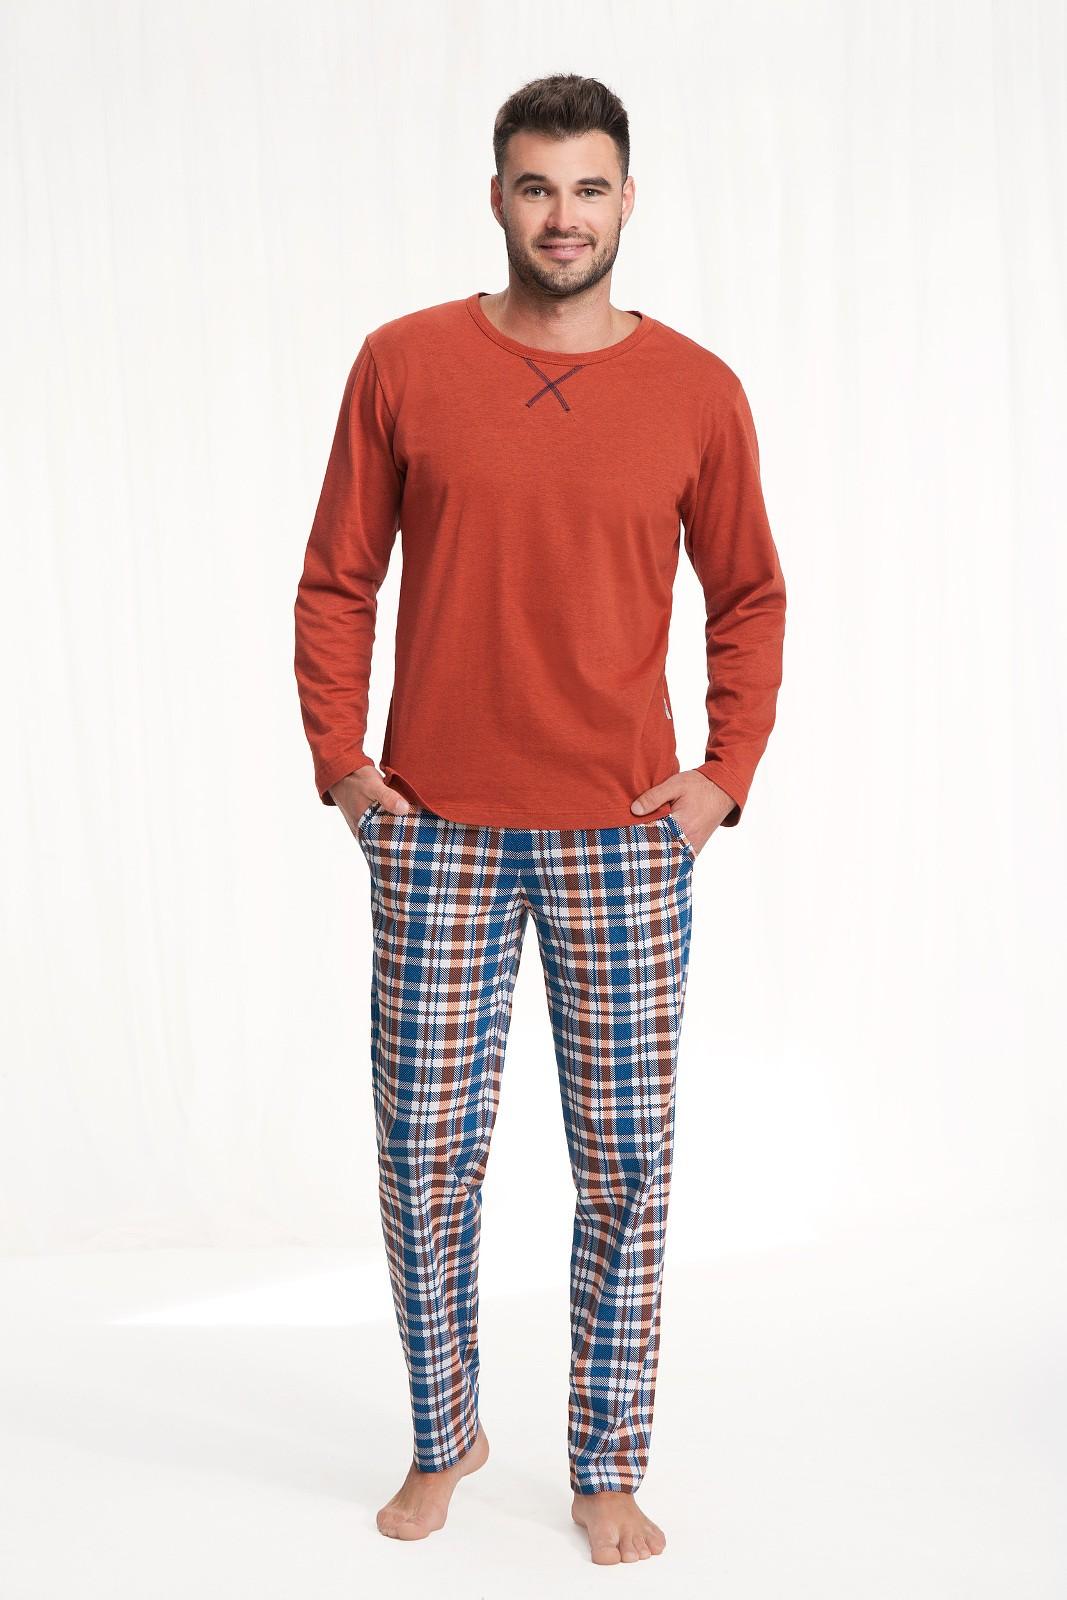 Pánské pyžamo Luna 700 dł/r 3XL